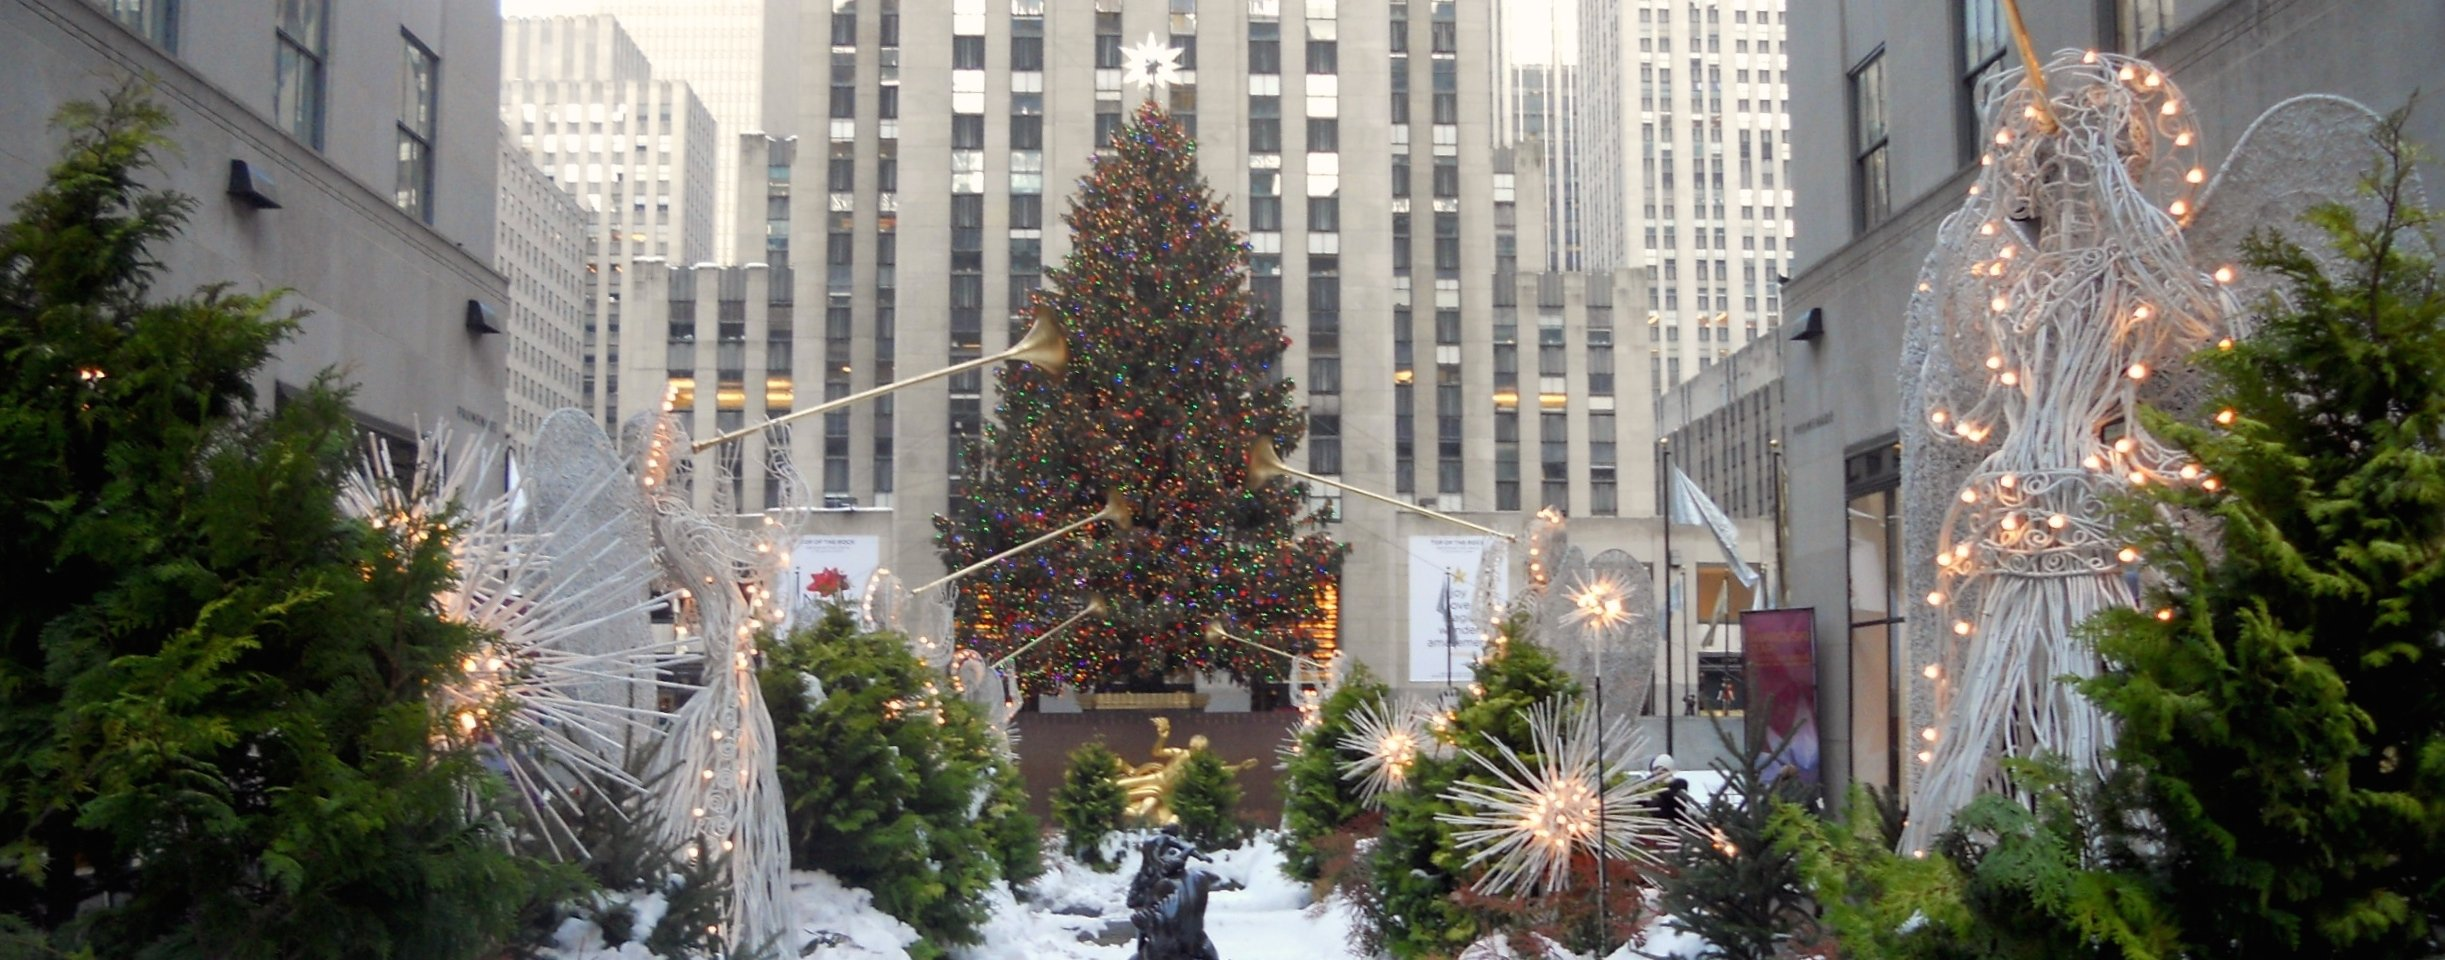 Decoration Noel Magique